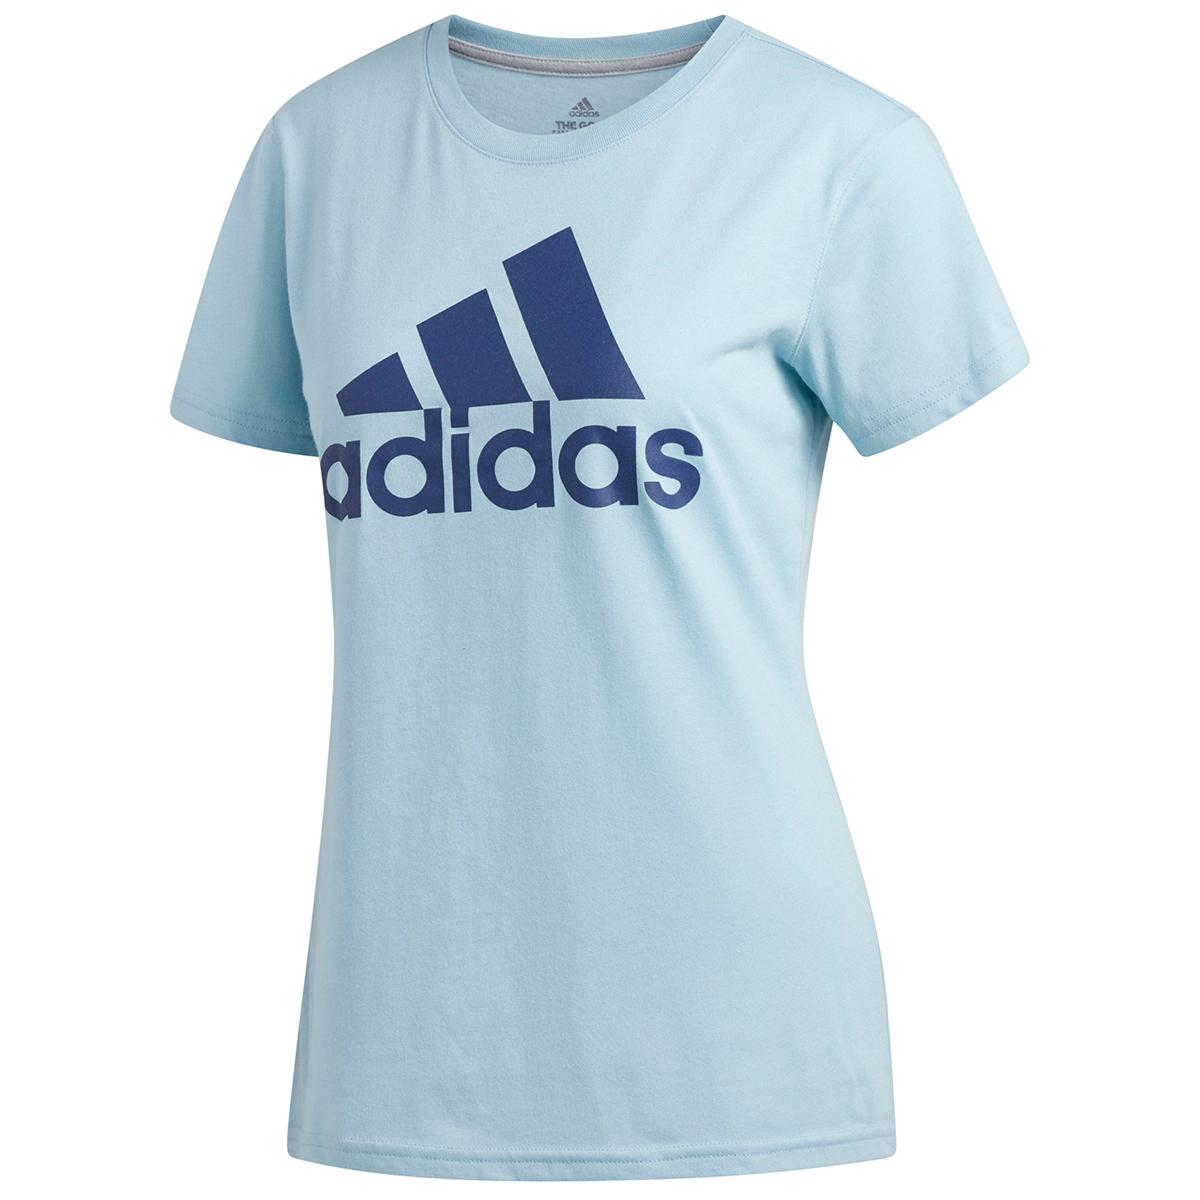 Adidas Women's Badge Of Sport Classic Short-Sleeve Tee - Blue, S